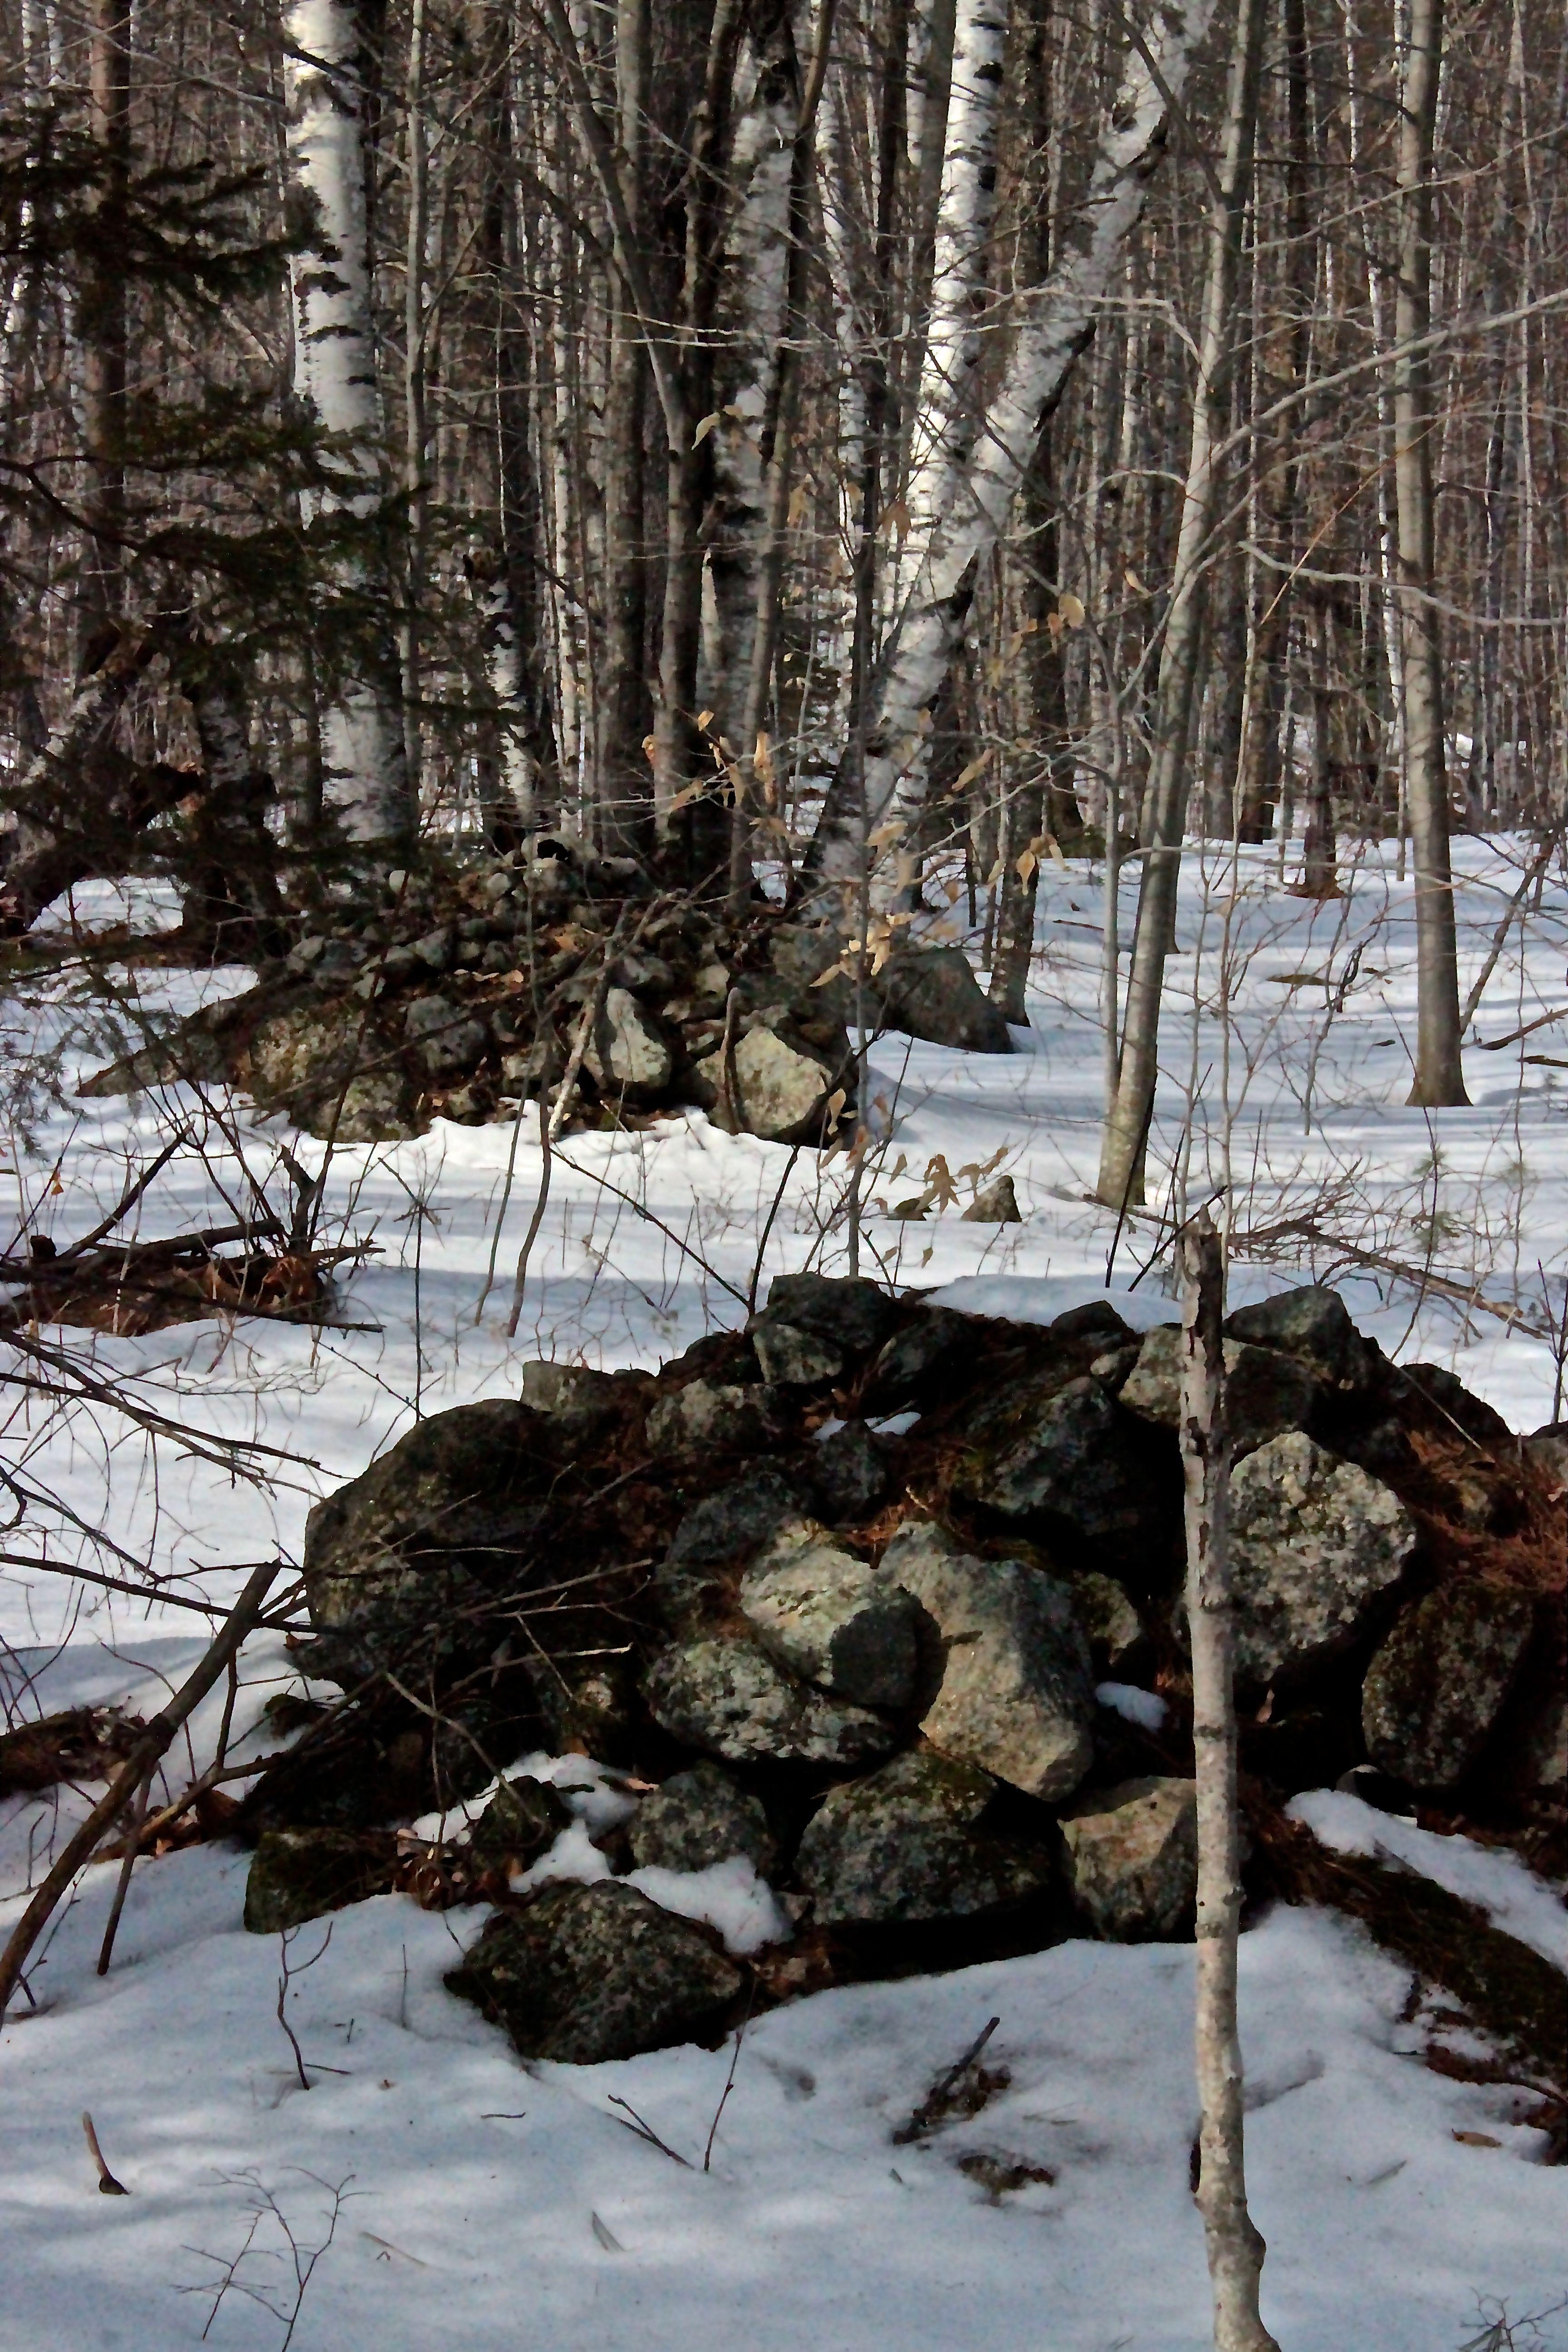 h-stone piles 1